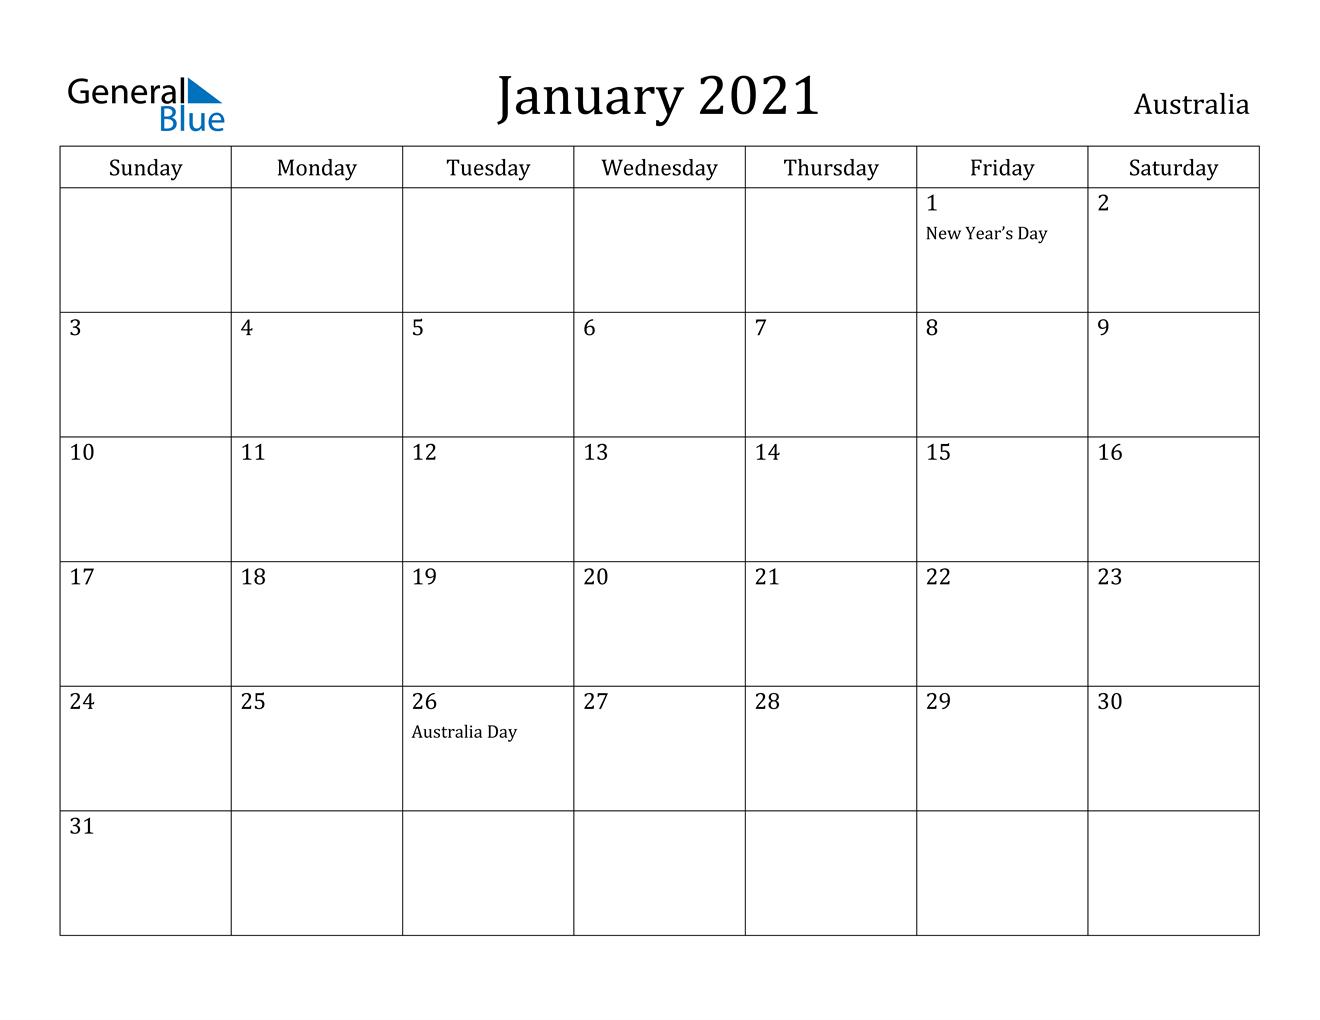 January 2021 Calendar - Australia